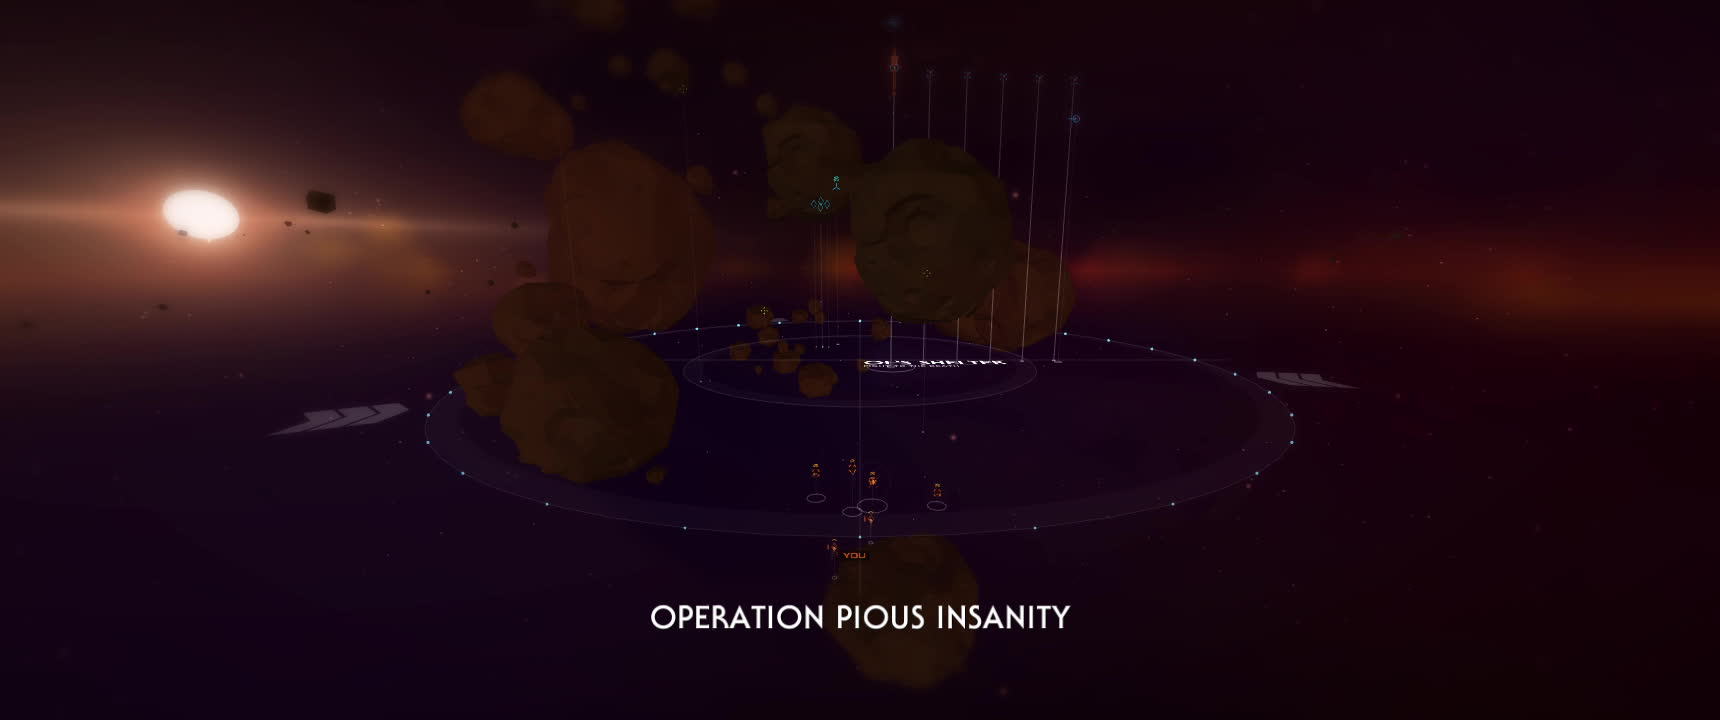 space, spacesimgames, virtualreality, Challenge Mode GIFs